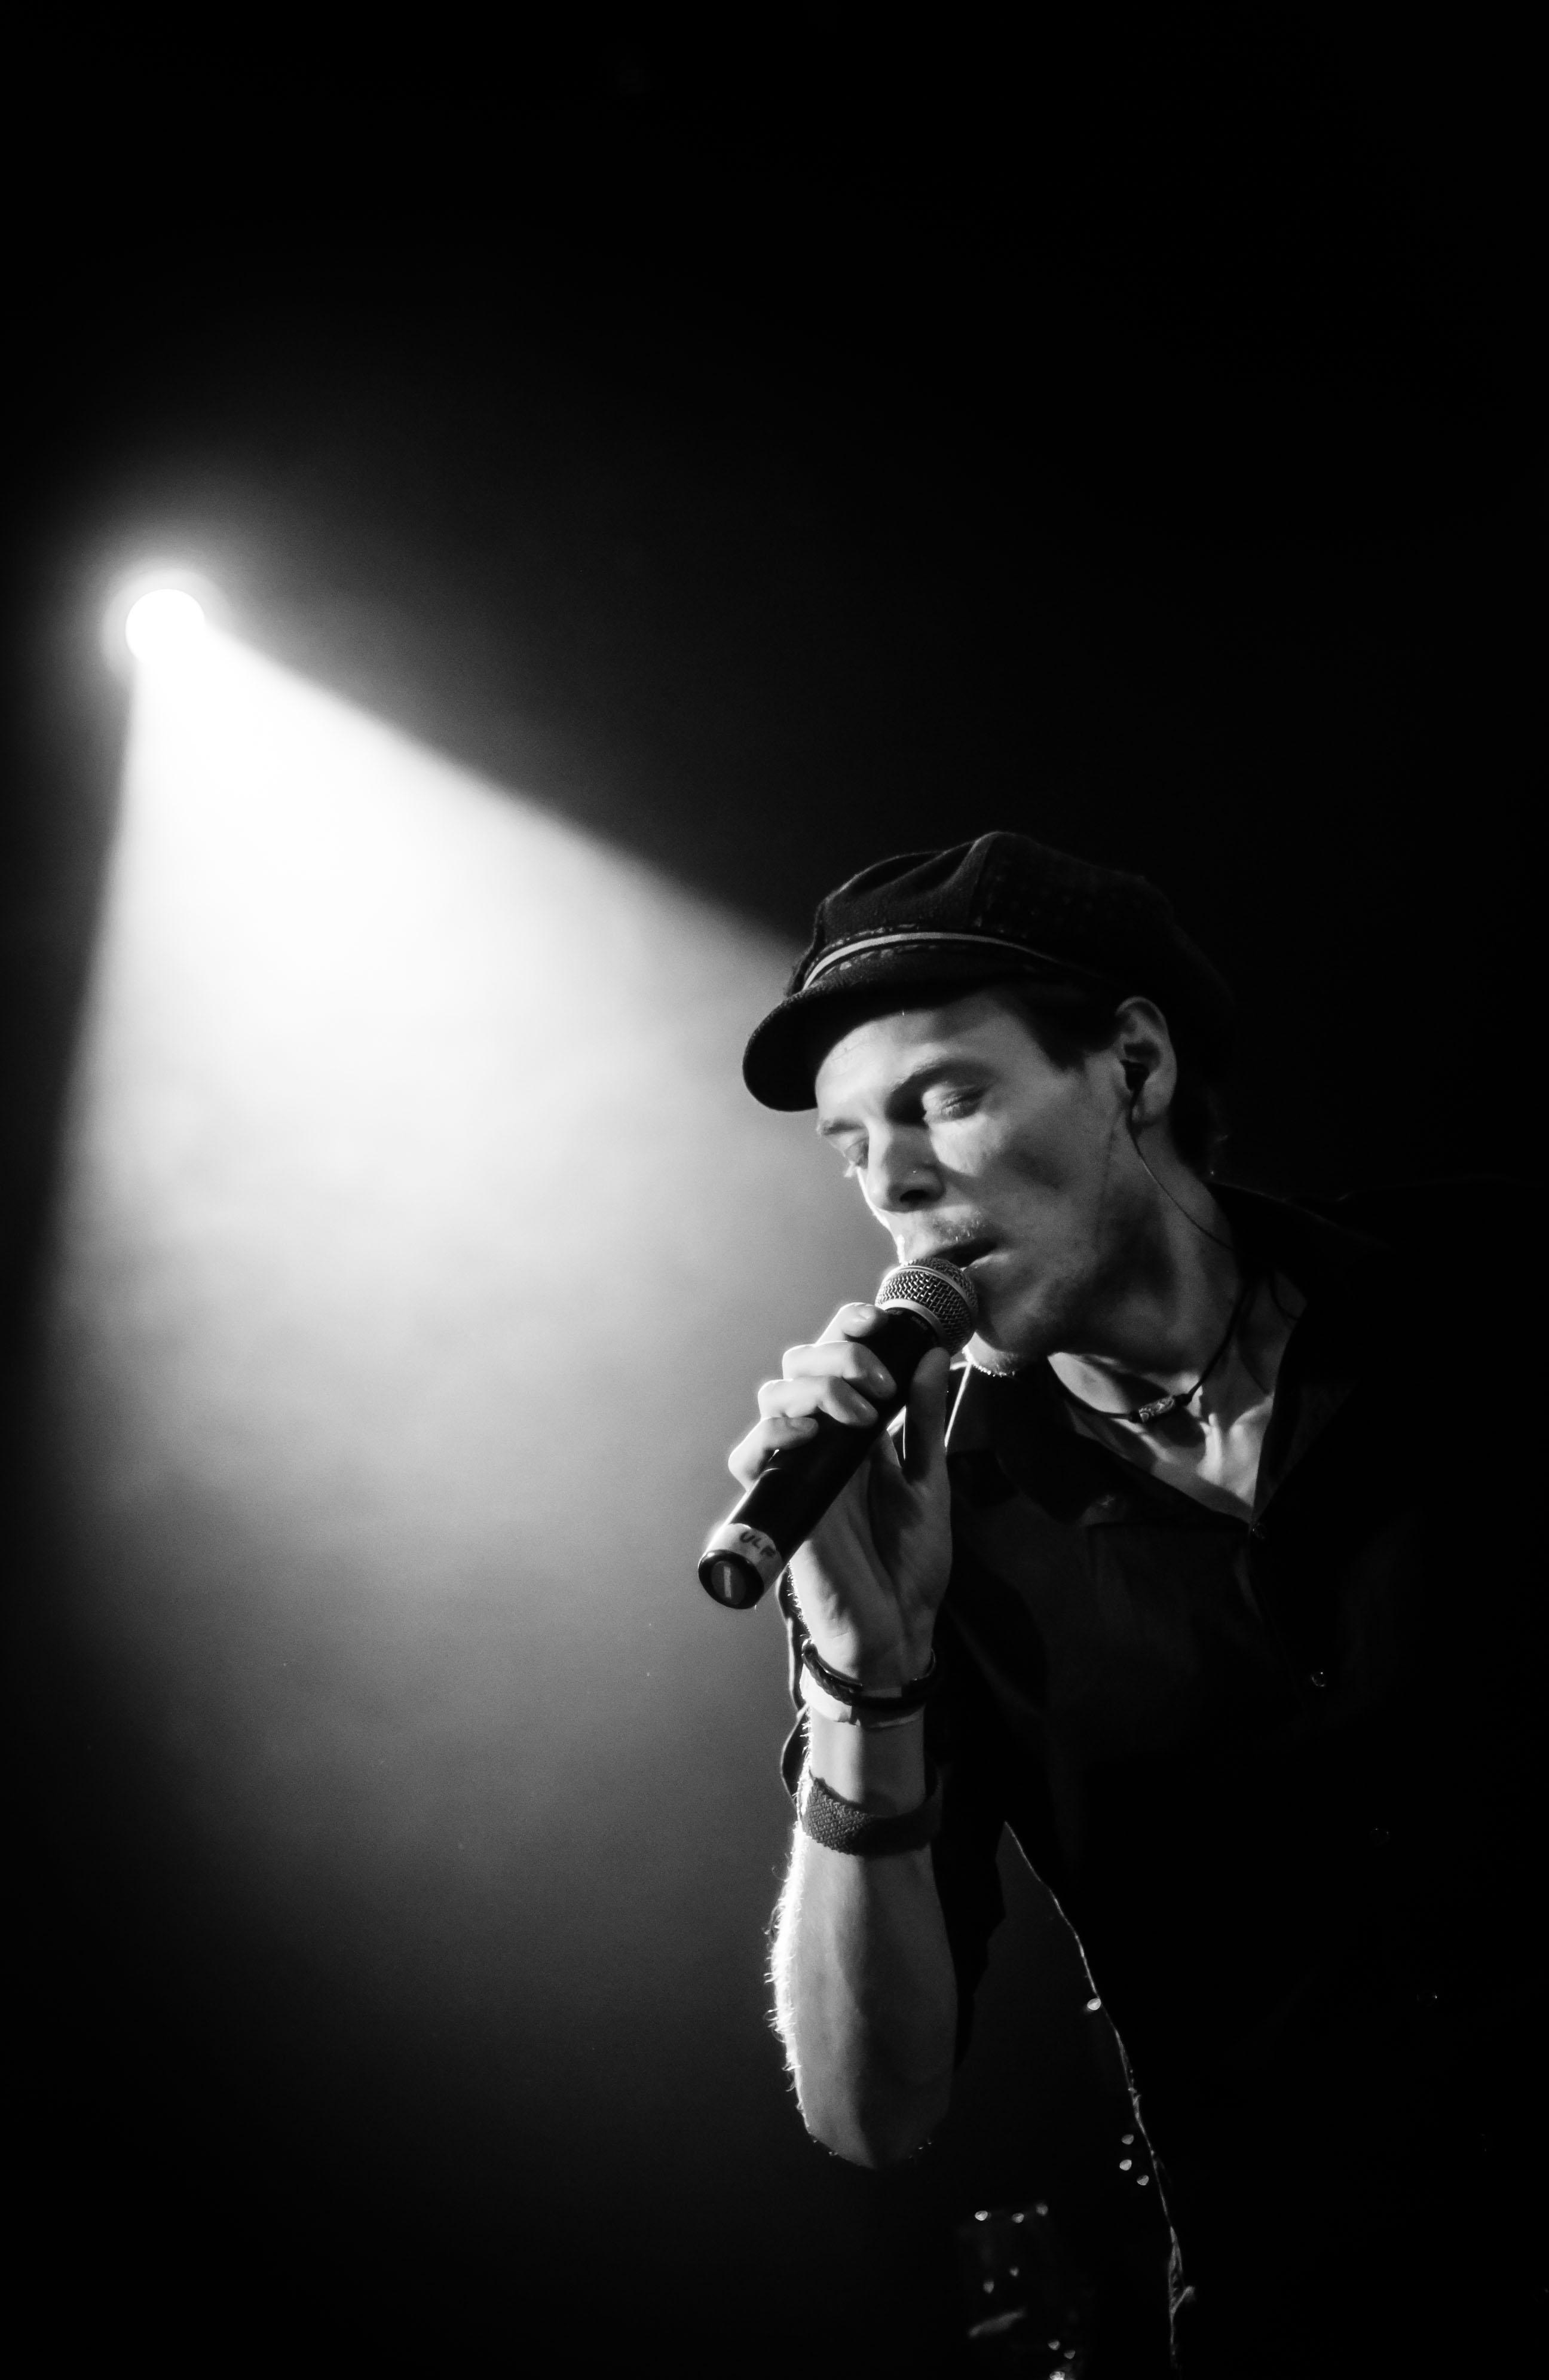 Photo: Brian Annerl